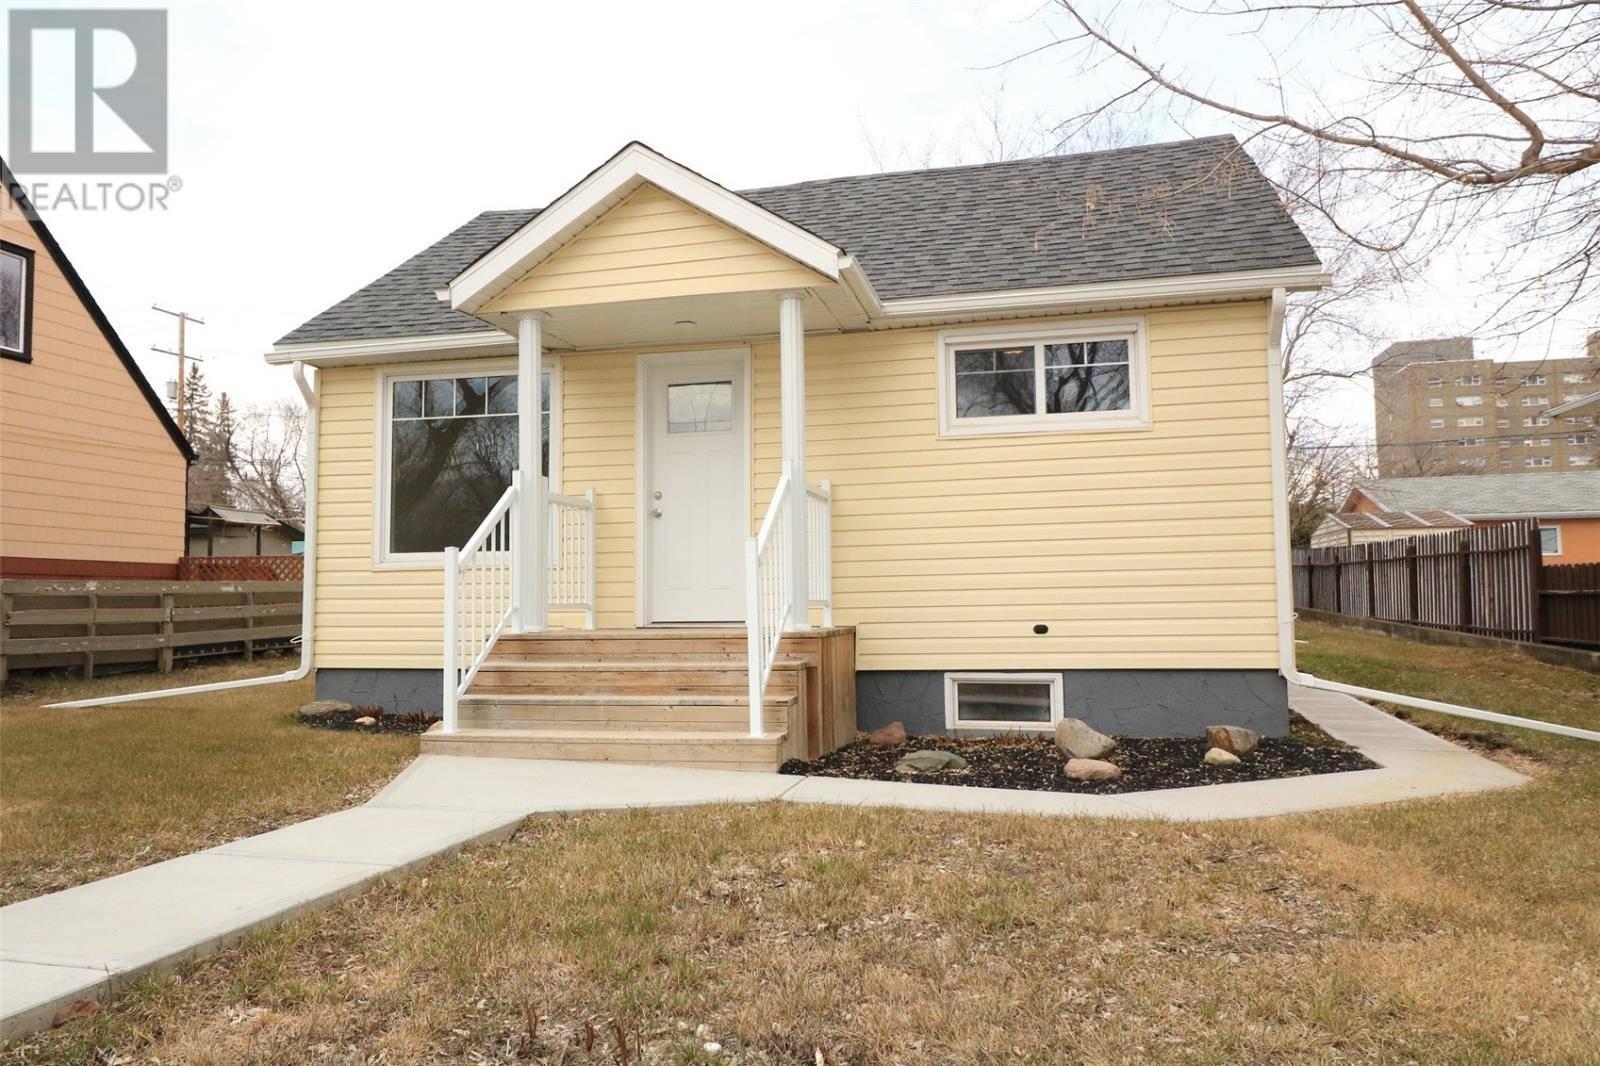 House for sale at 1212 97th St North Battleford Saskatchewan - MLS: SK767622